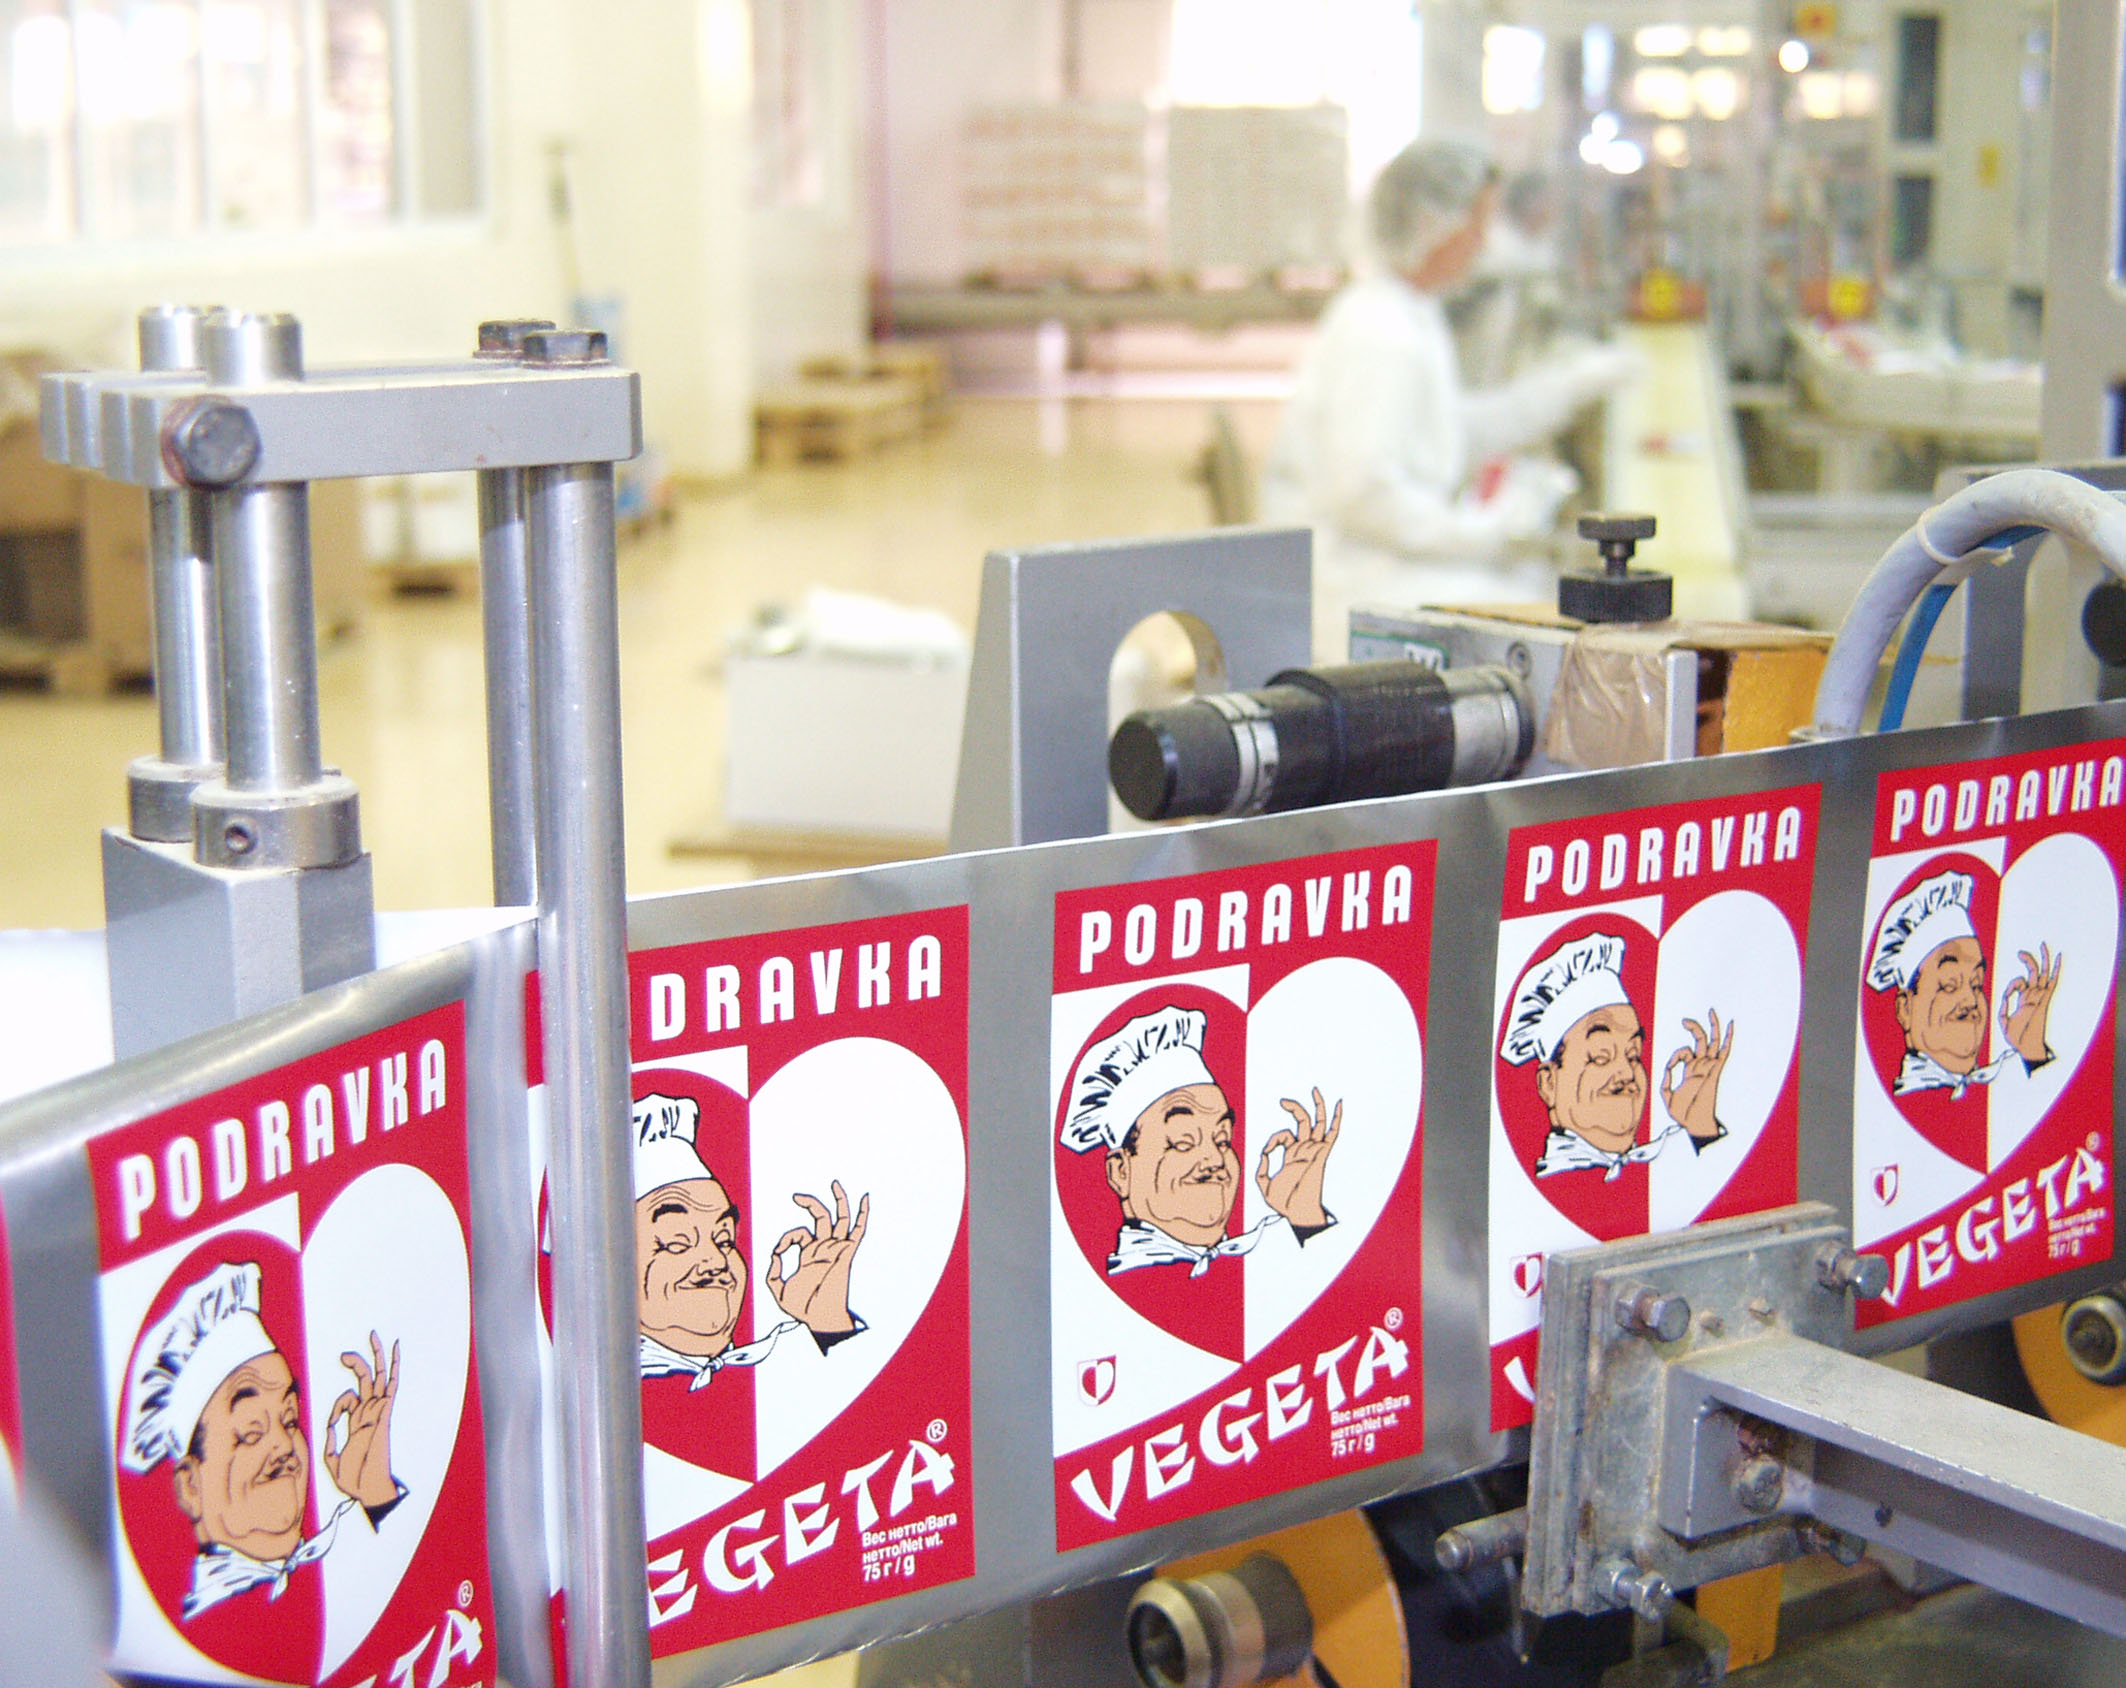 Croatia's Podravka to hike capital of drug making unit Belupo